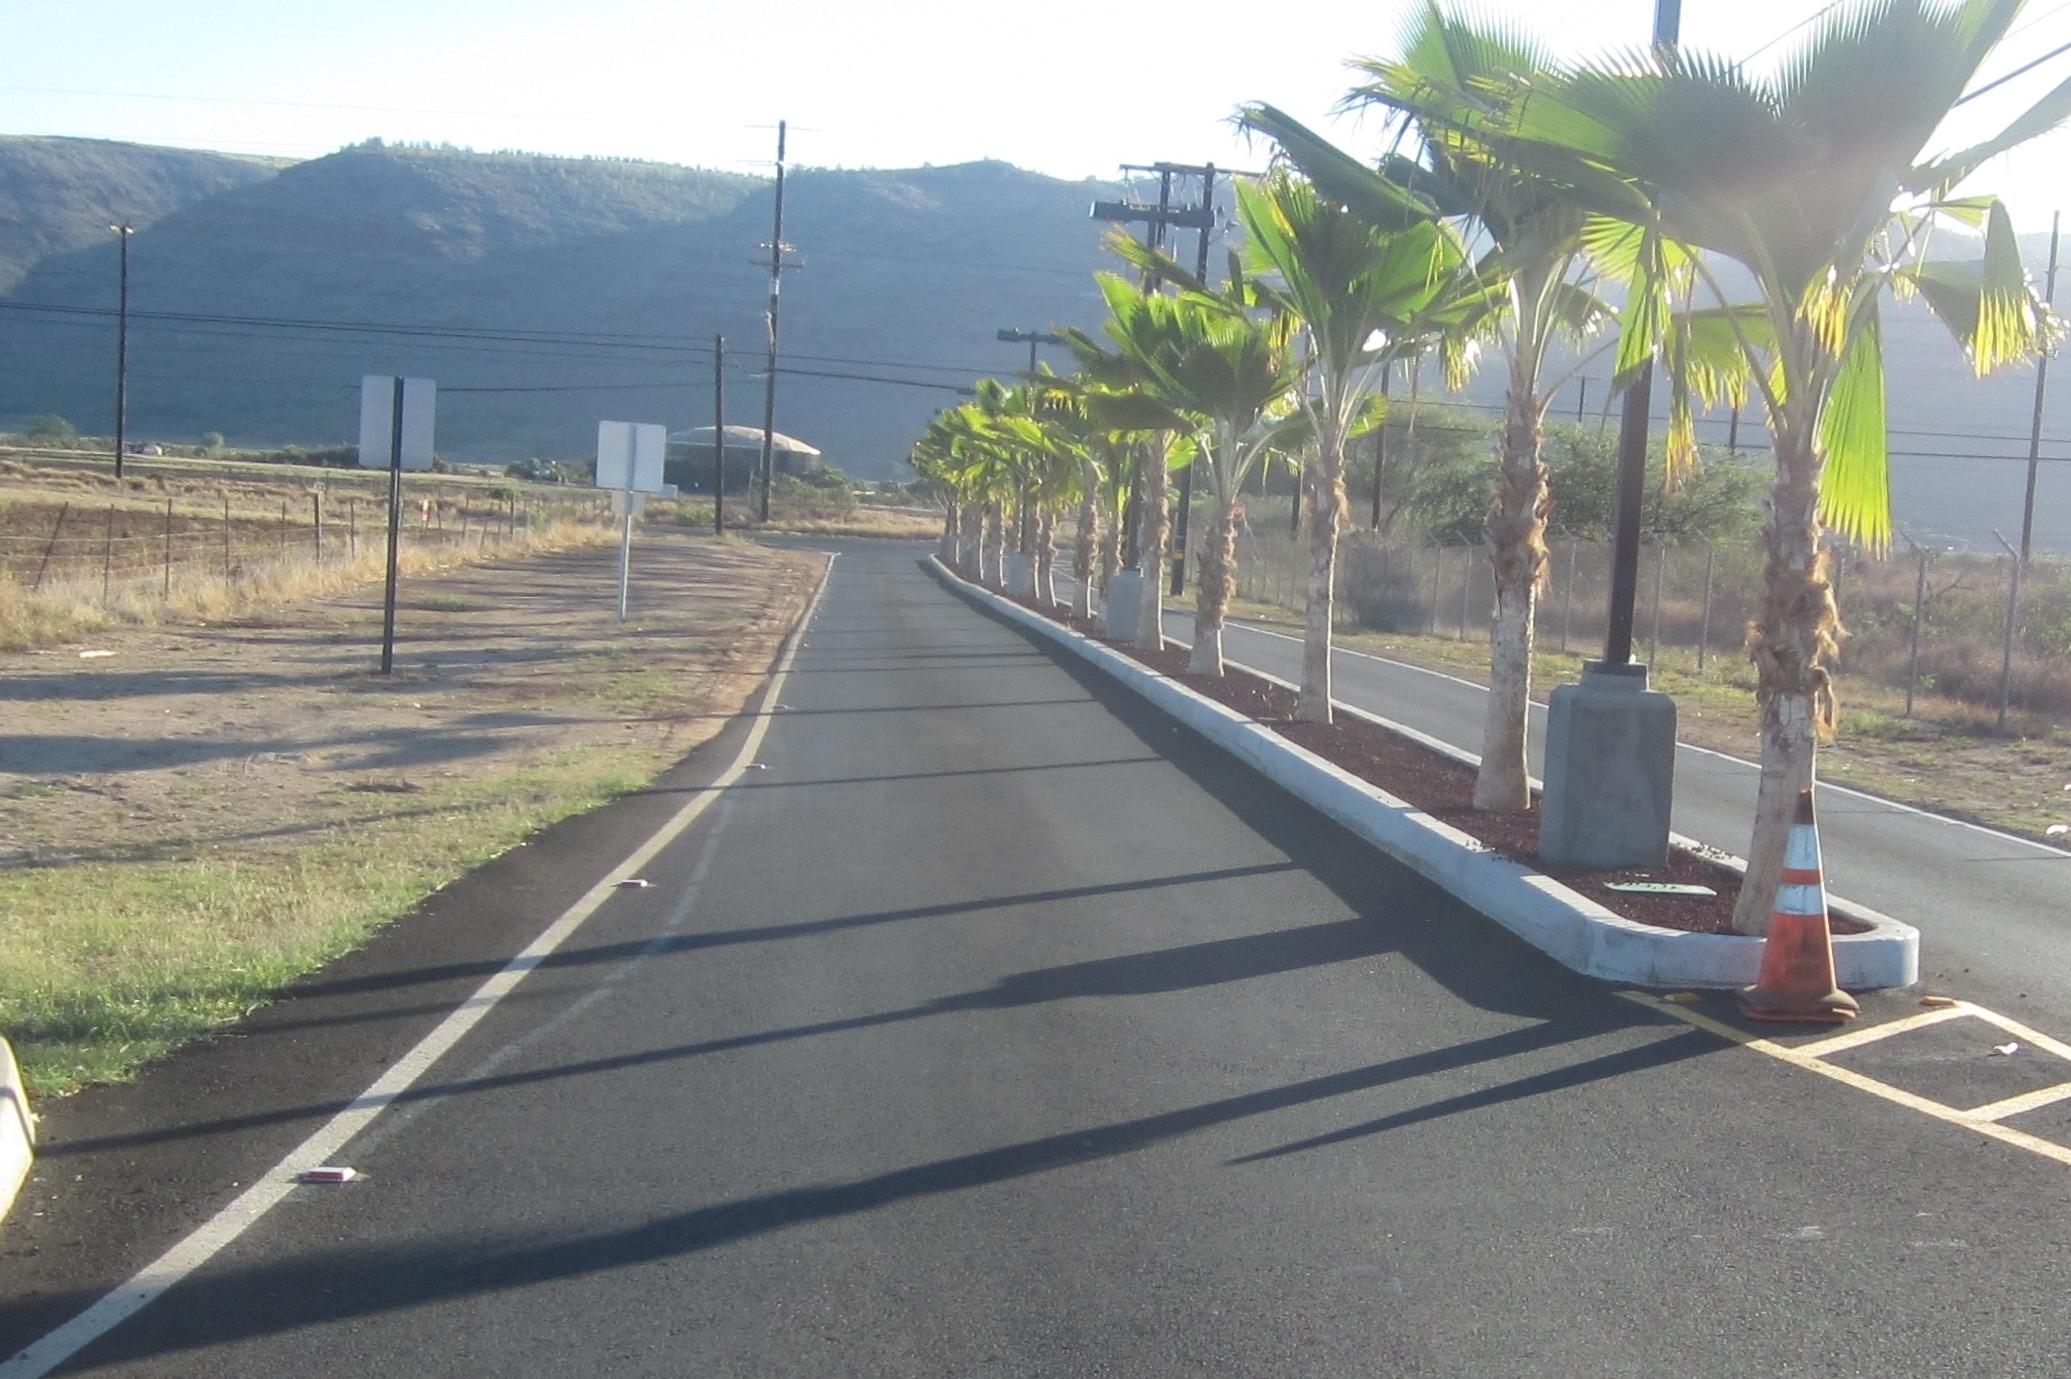 North Gate Image